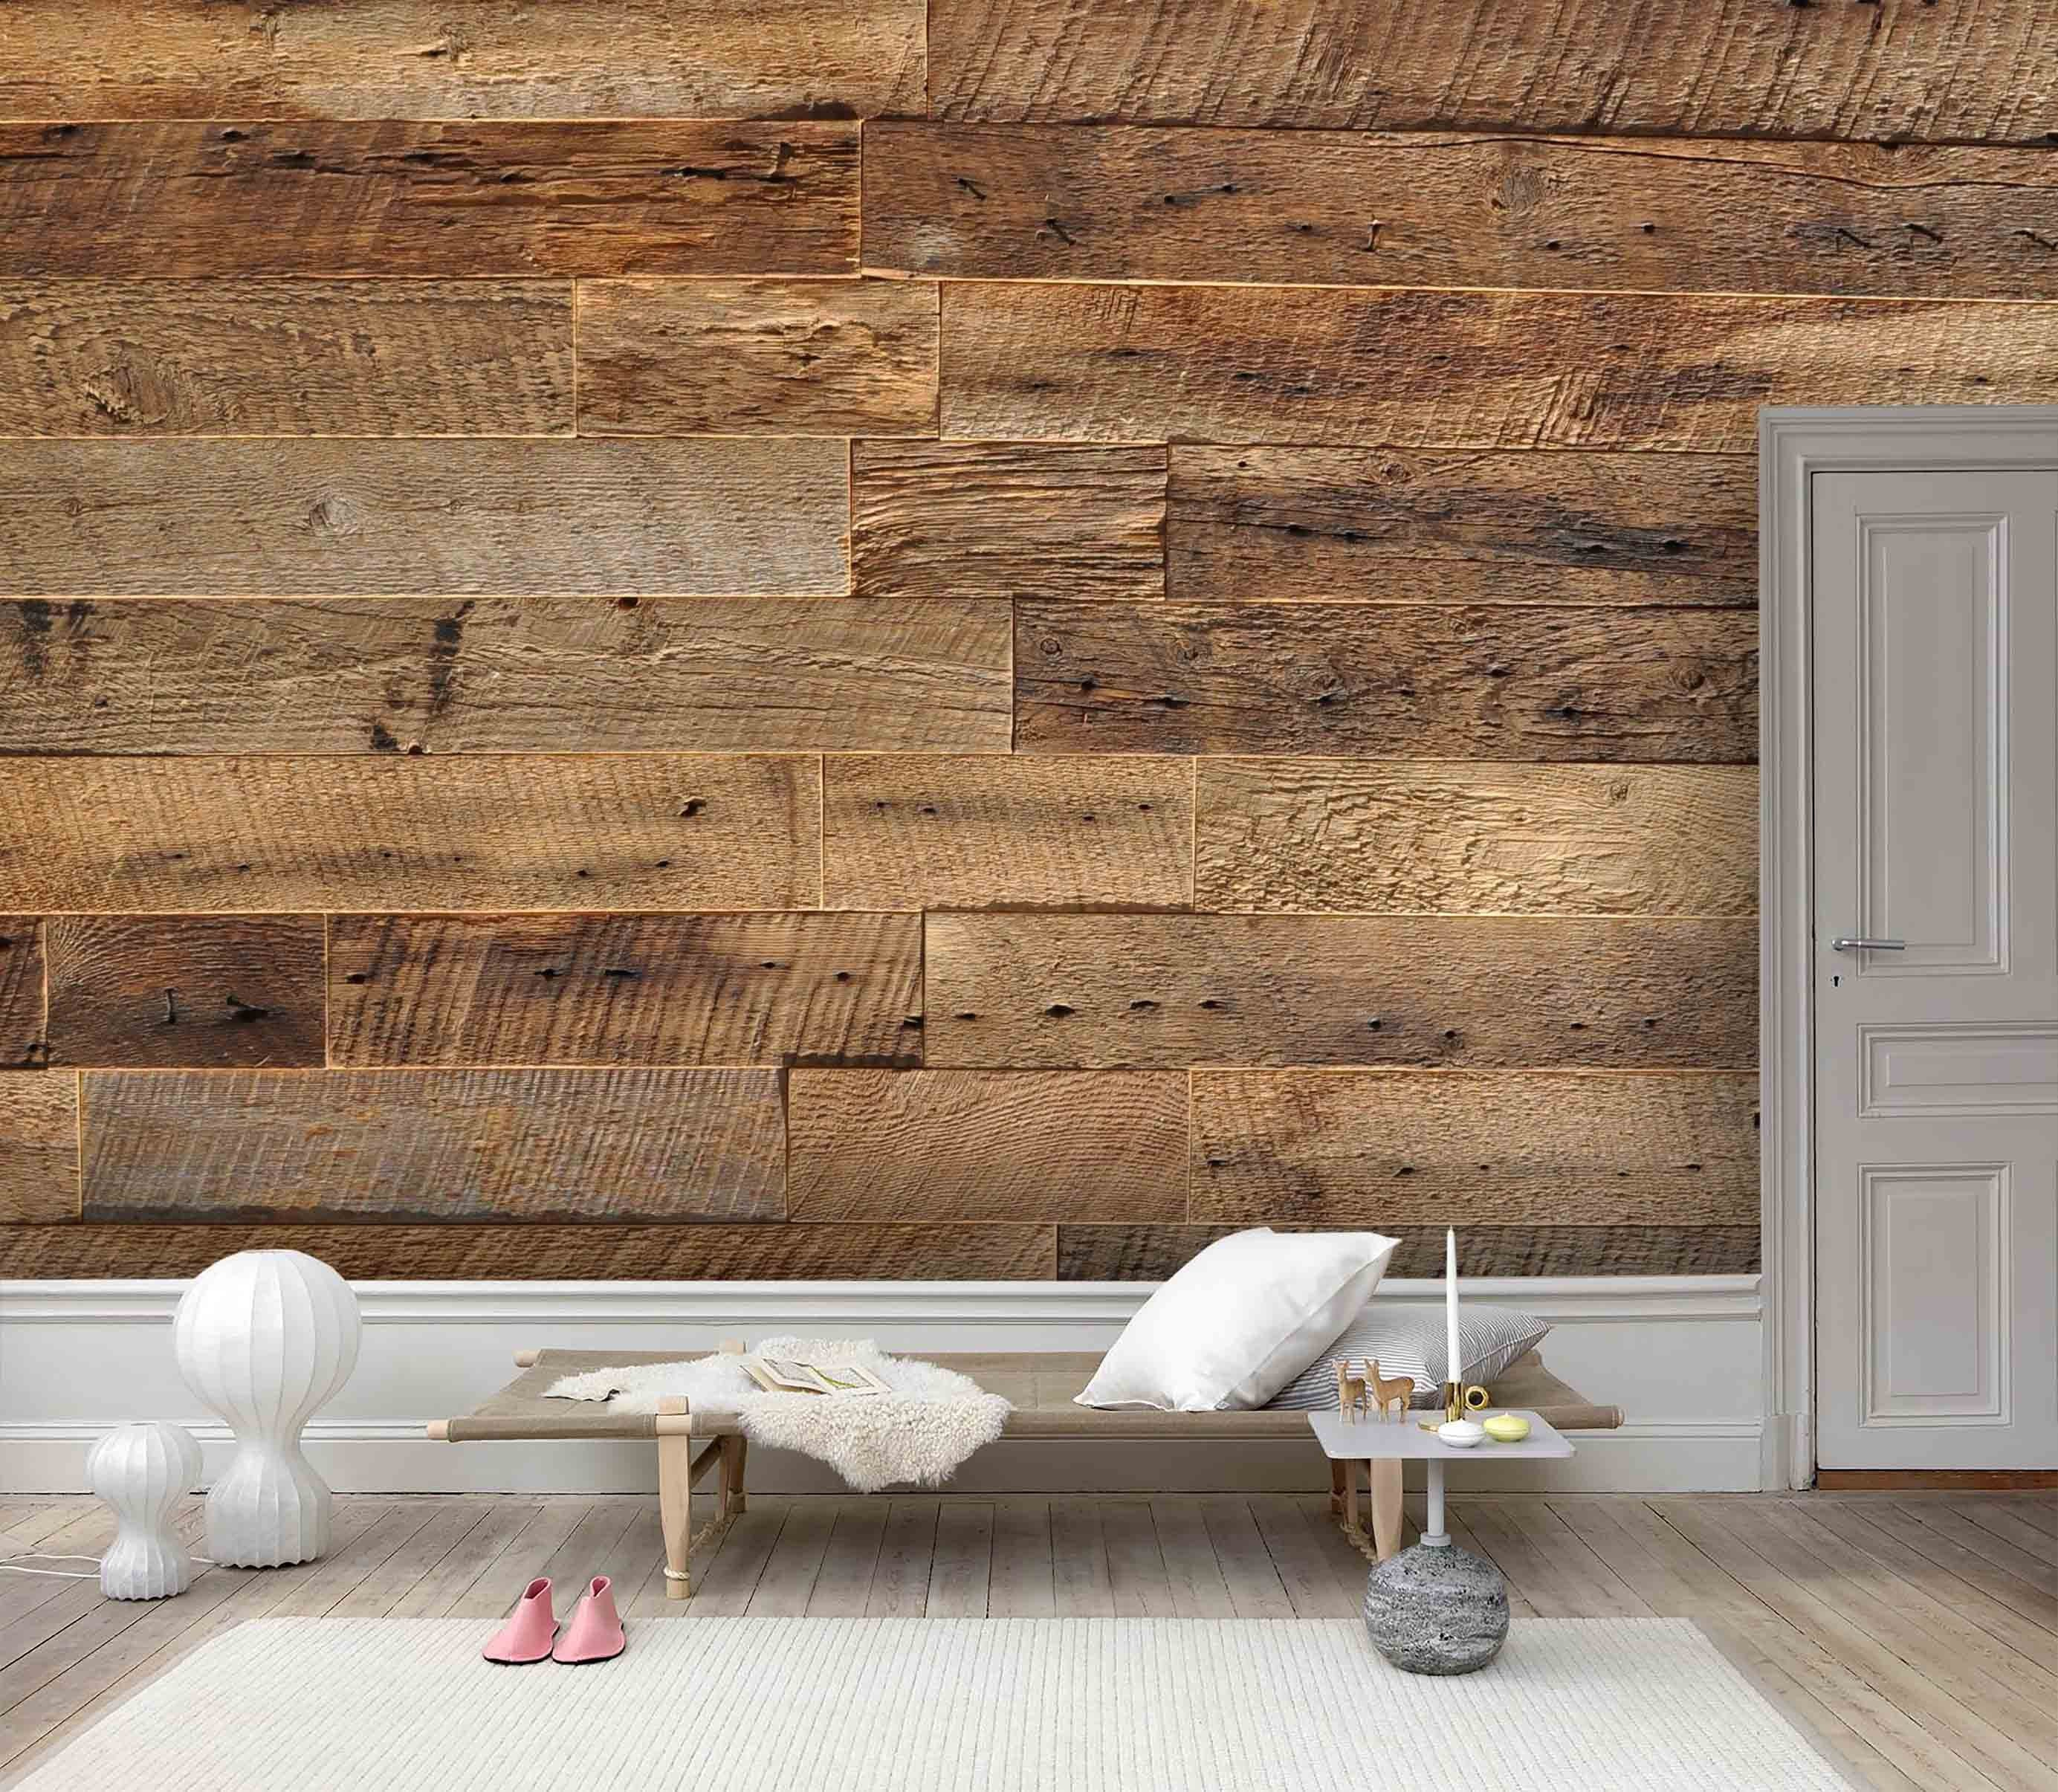 3D Dry, Wood texture Wallpaper